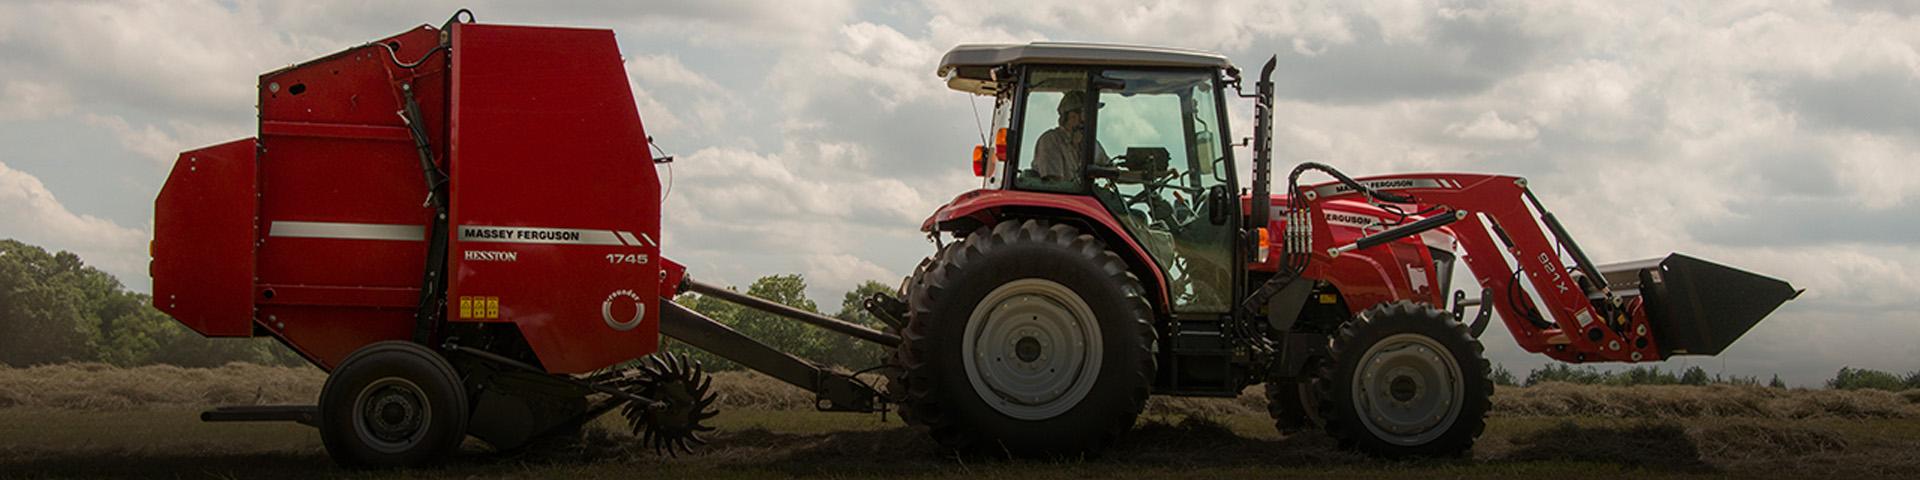 Tractor - Low Country Massey Ferguson - Pooler, GA